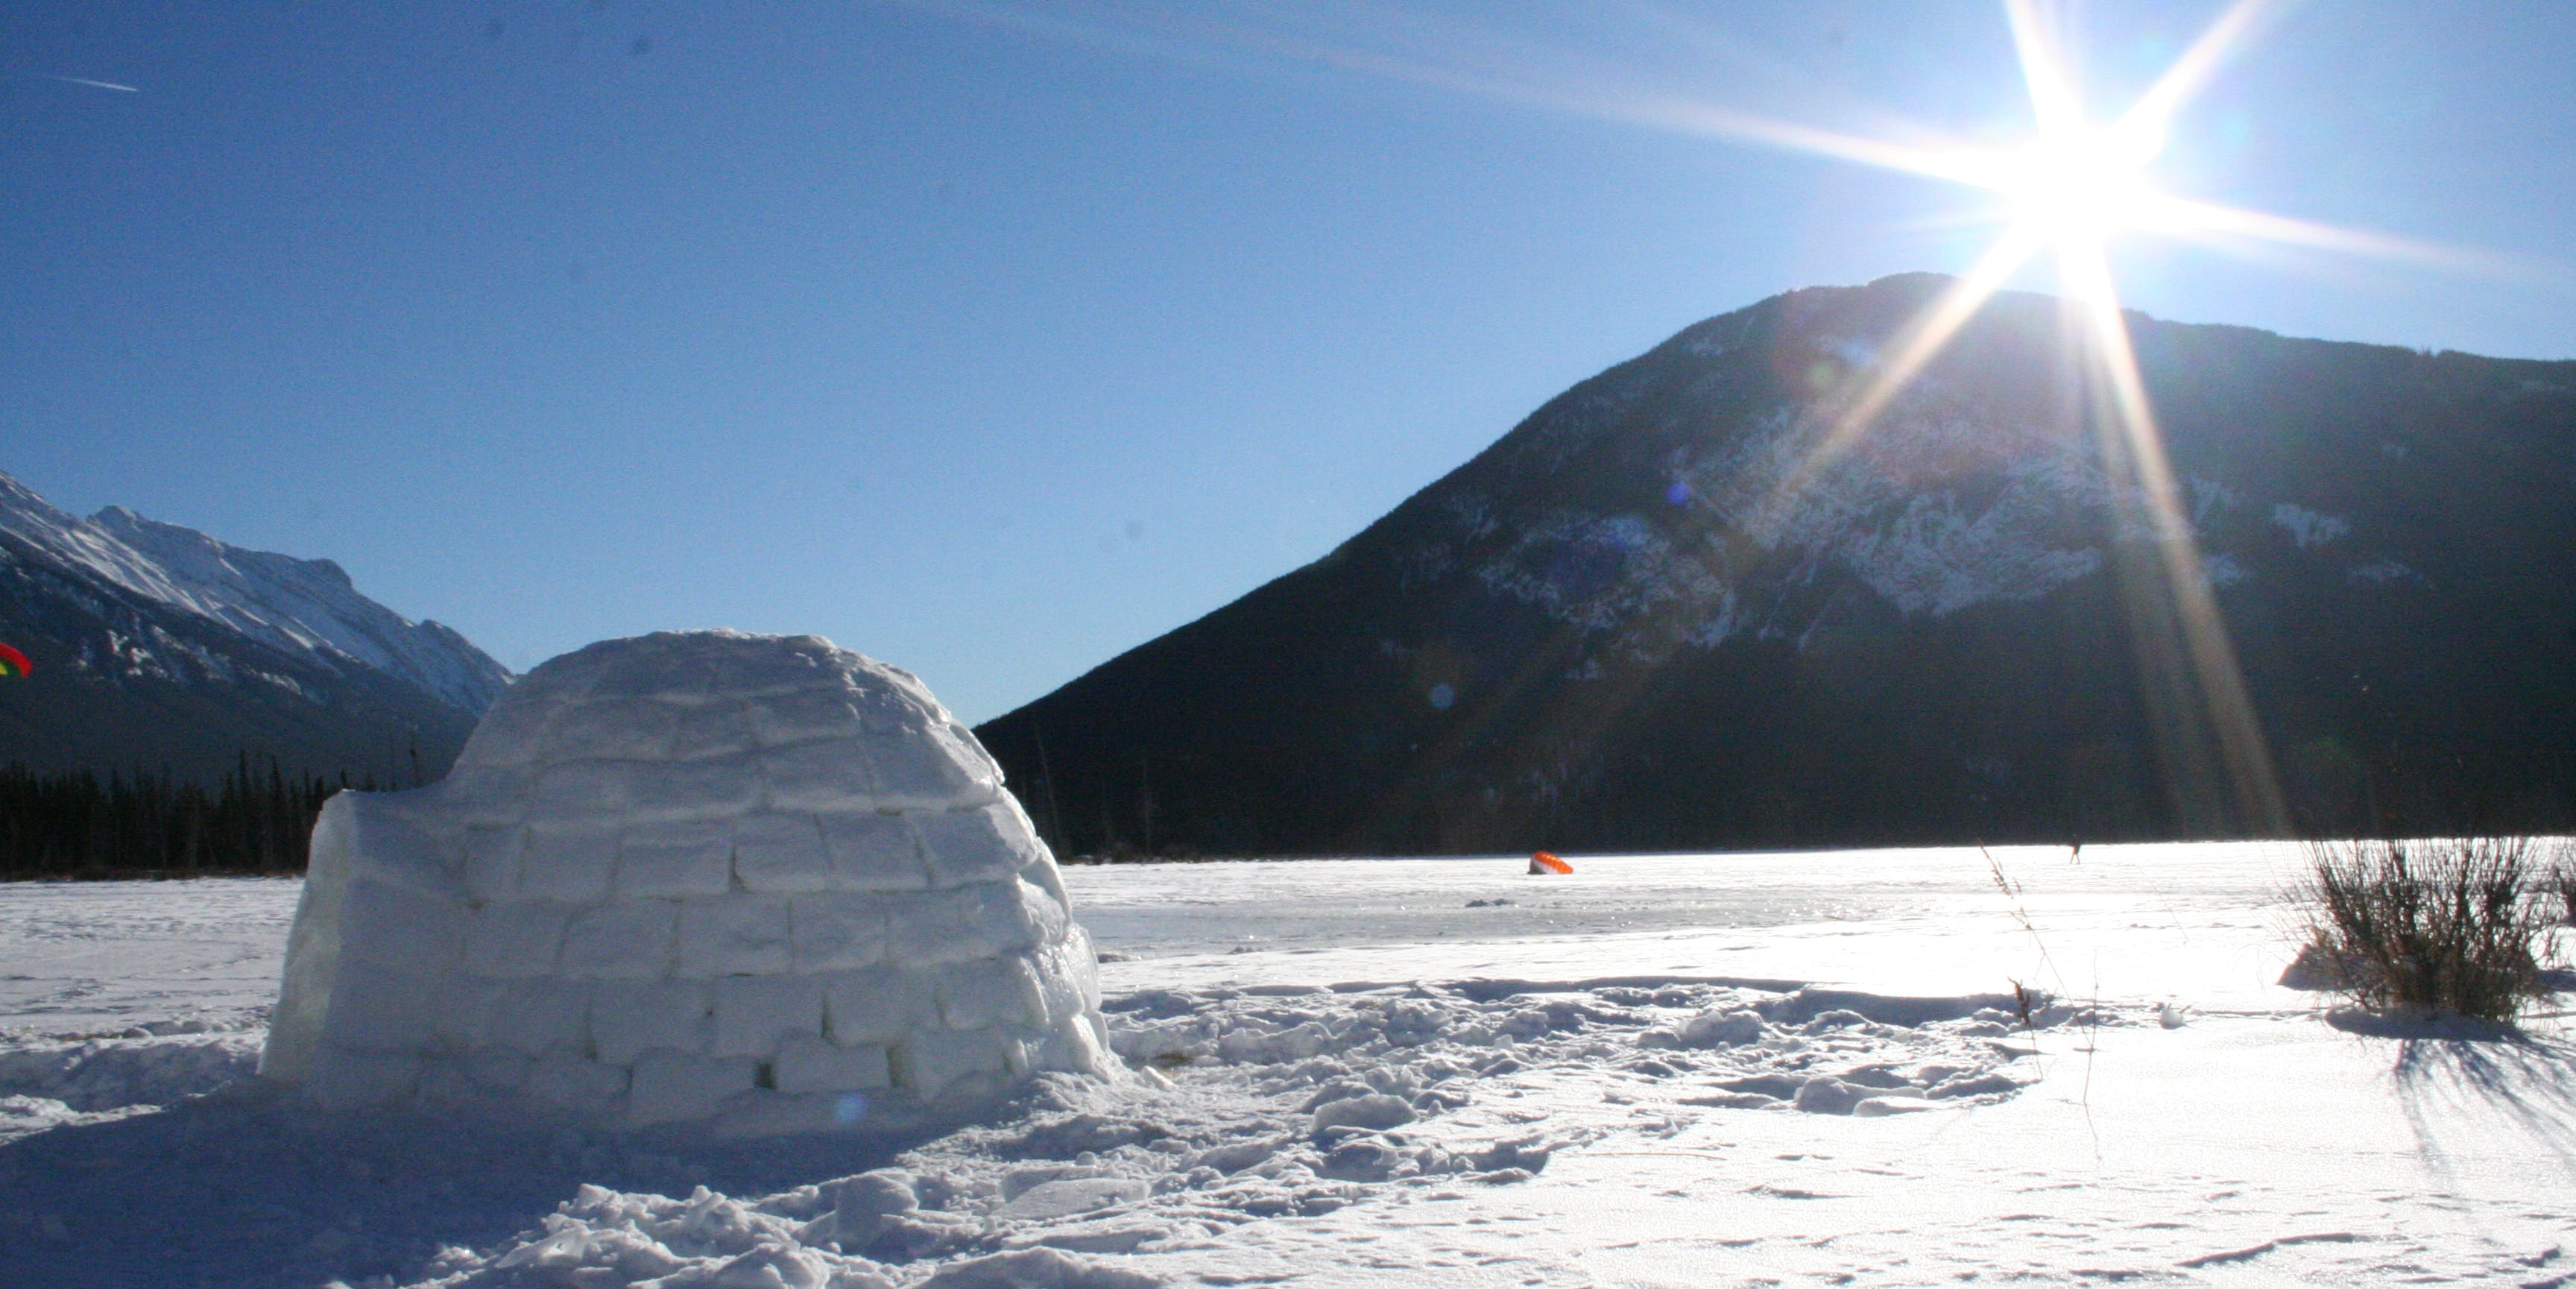 Improvised igloo building on the Vermillion Lakes outside Banff, Alberta Canada.